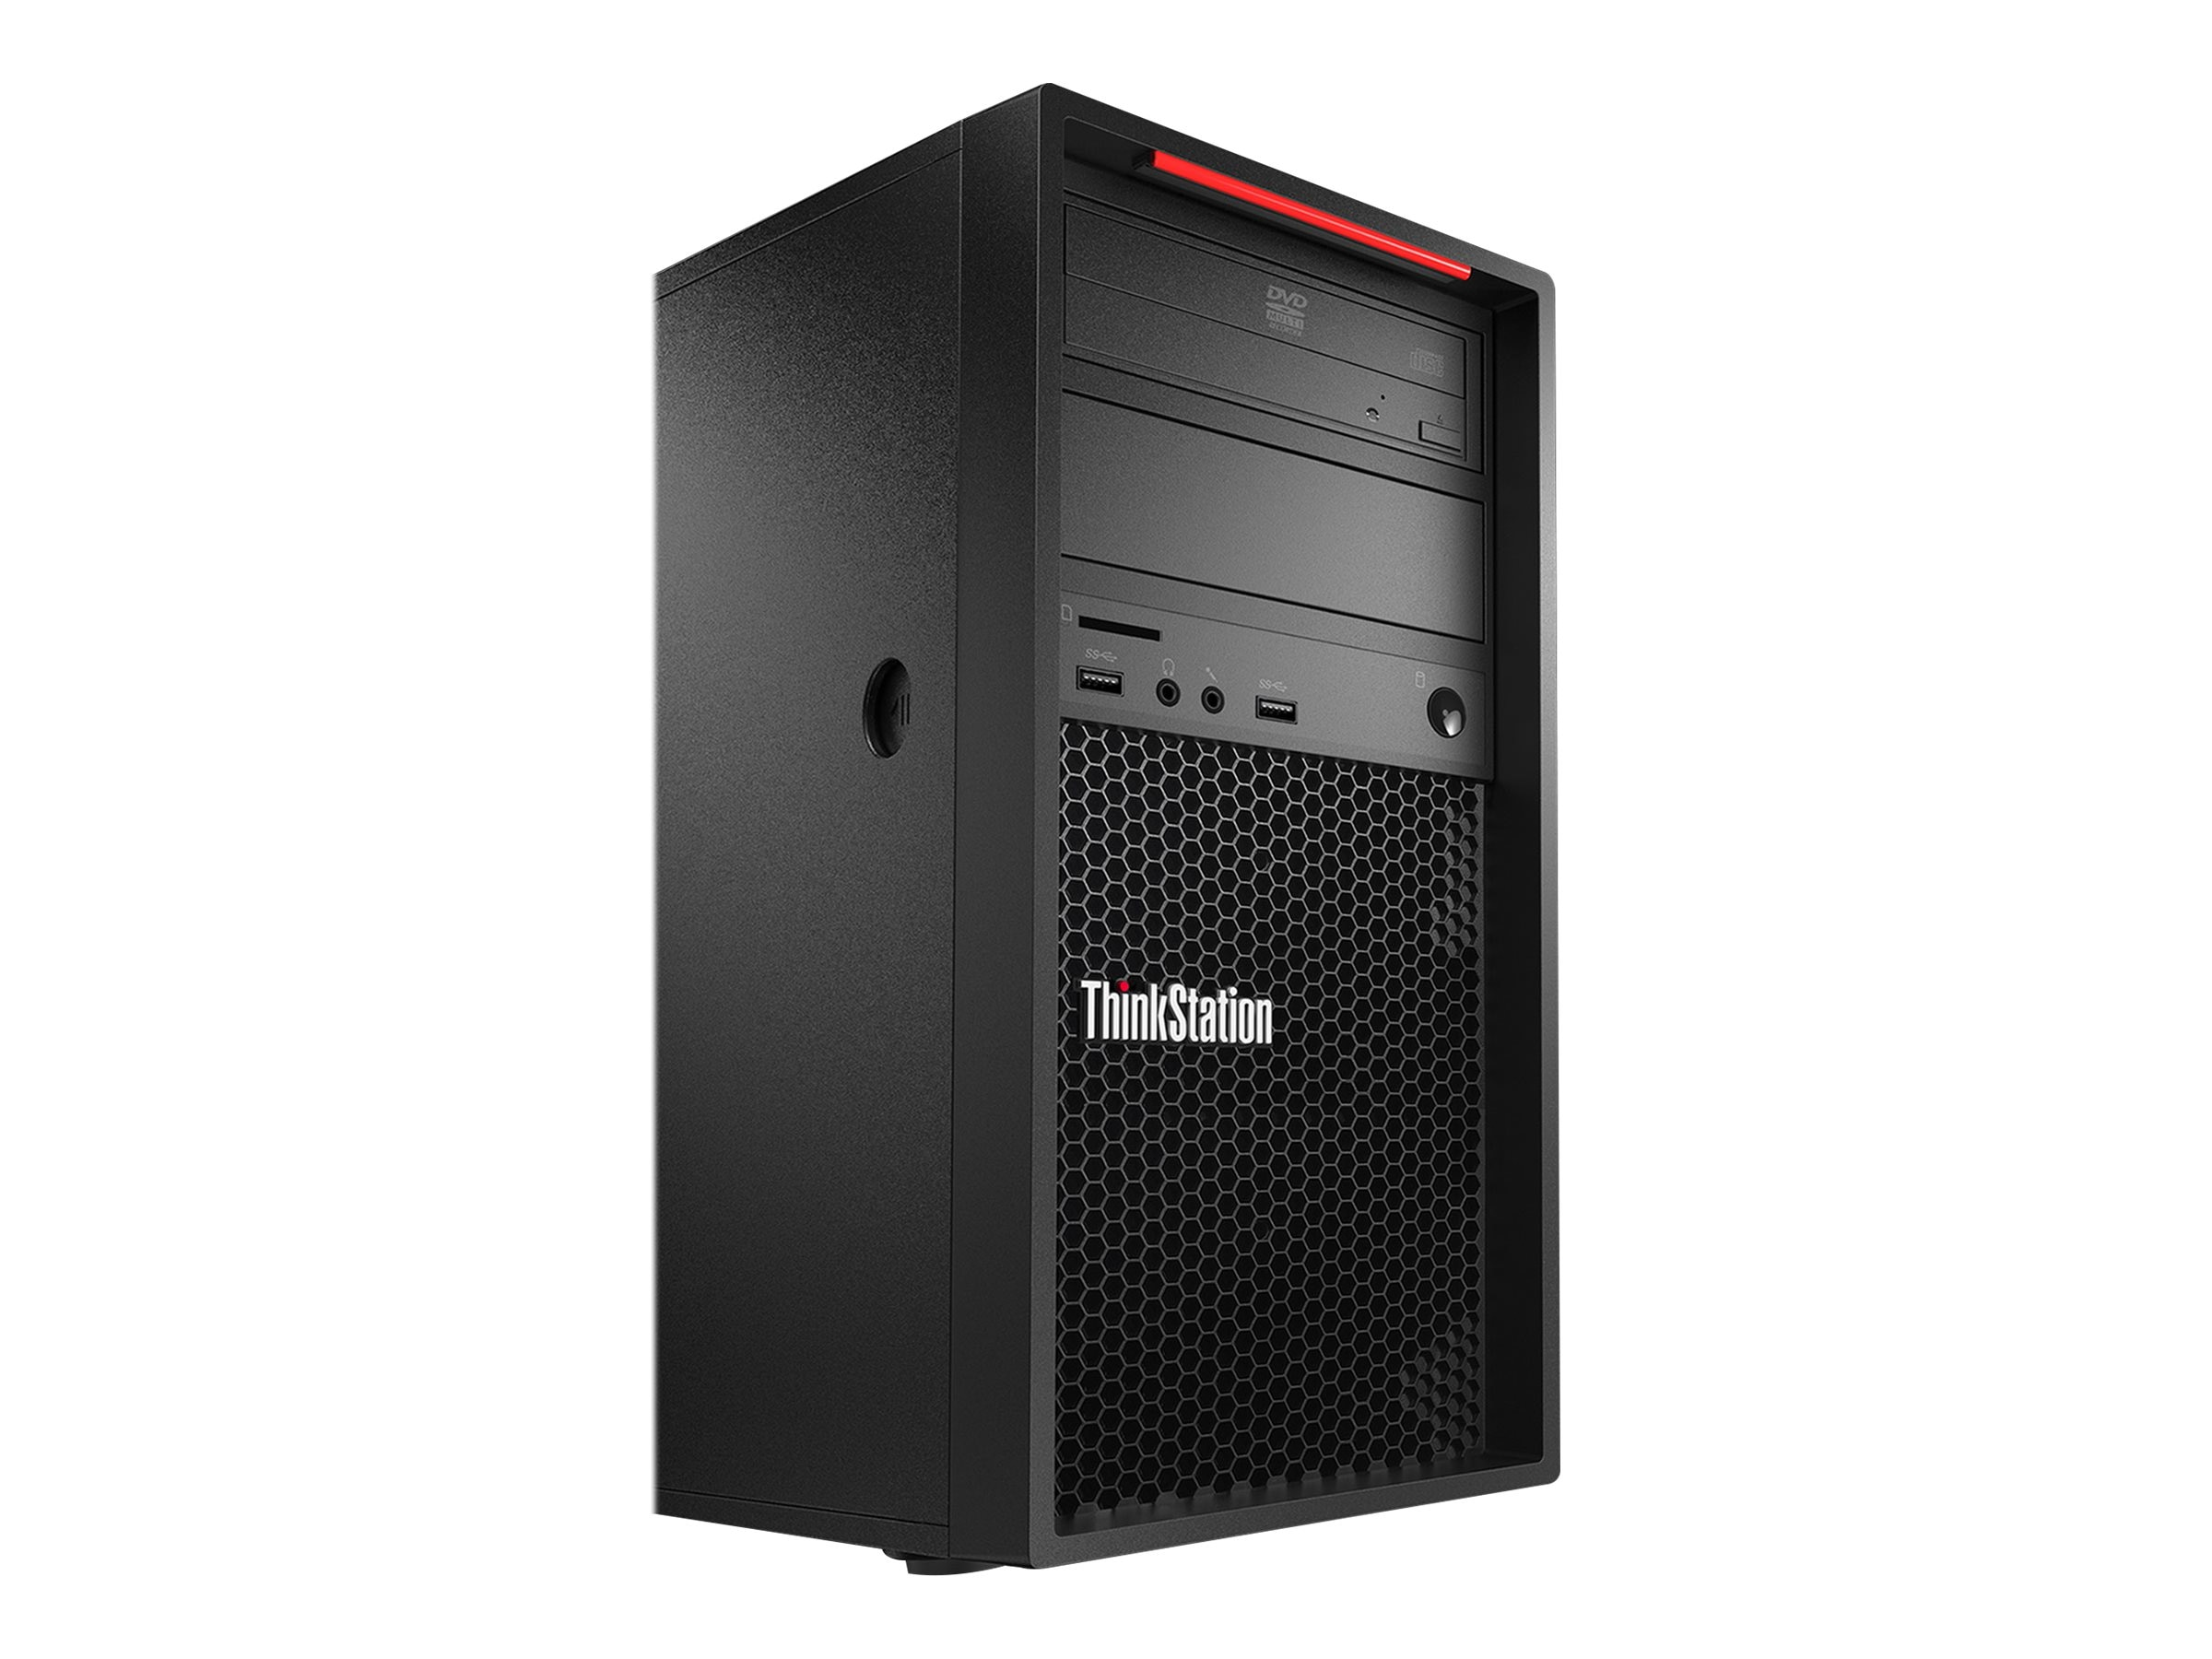 Lenovo ThinkStation P520c 3 6GHz Xeon Windows 10 Pro 64-bit Edition